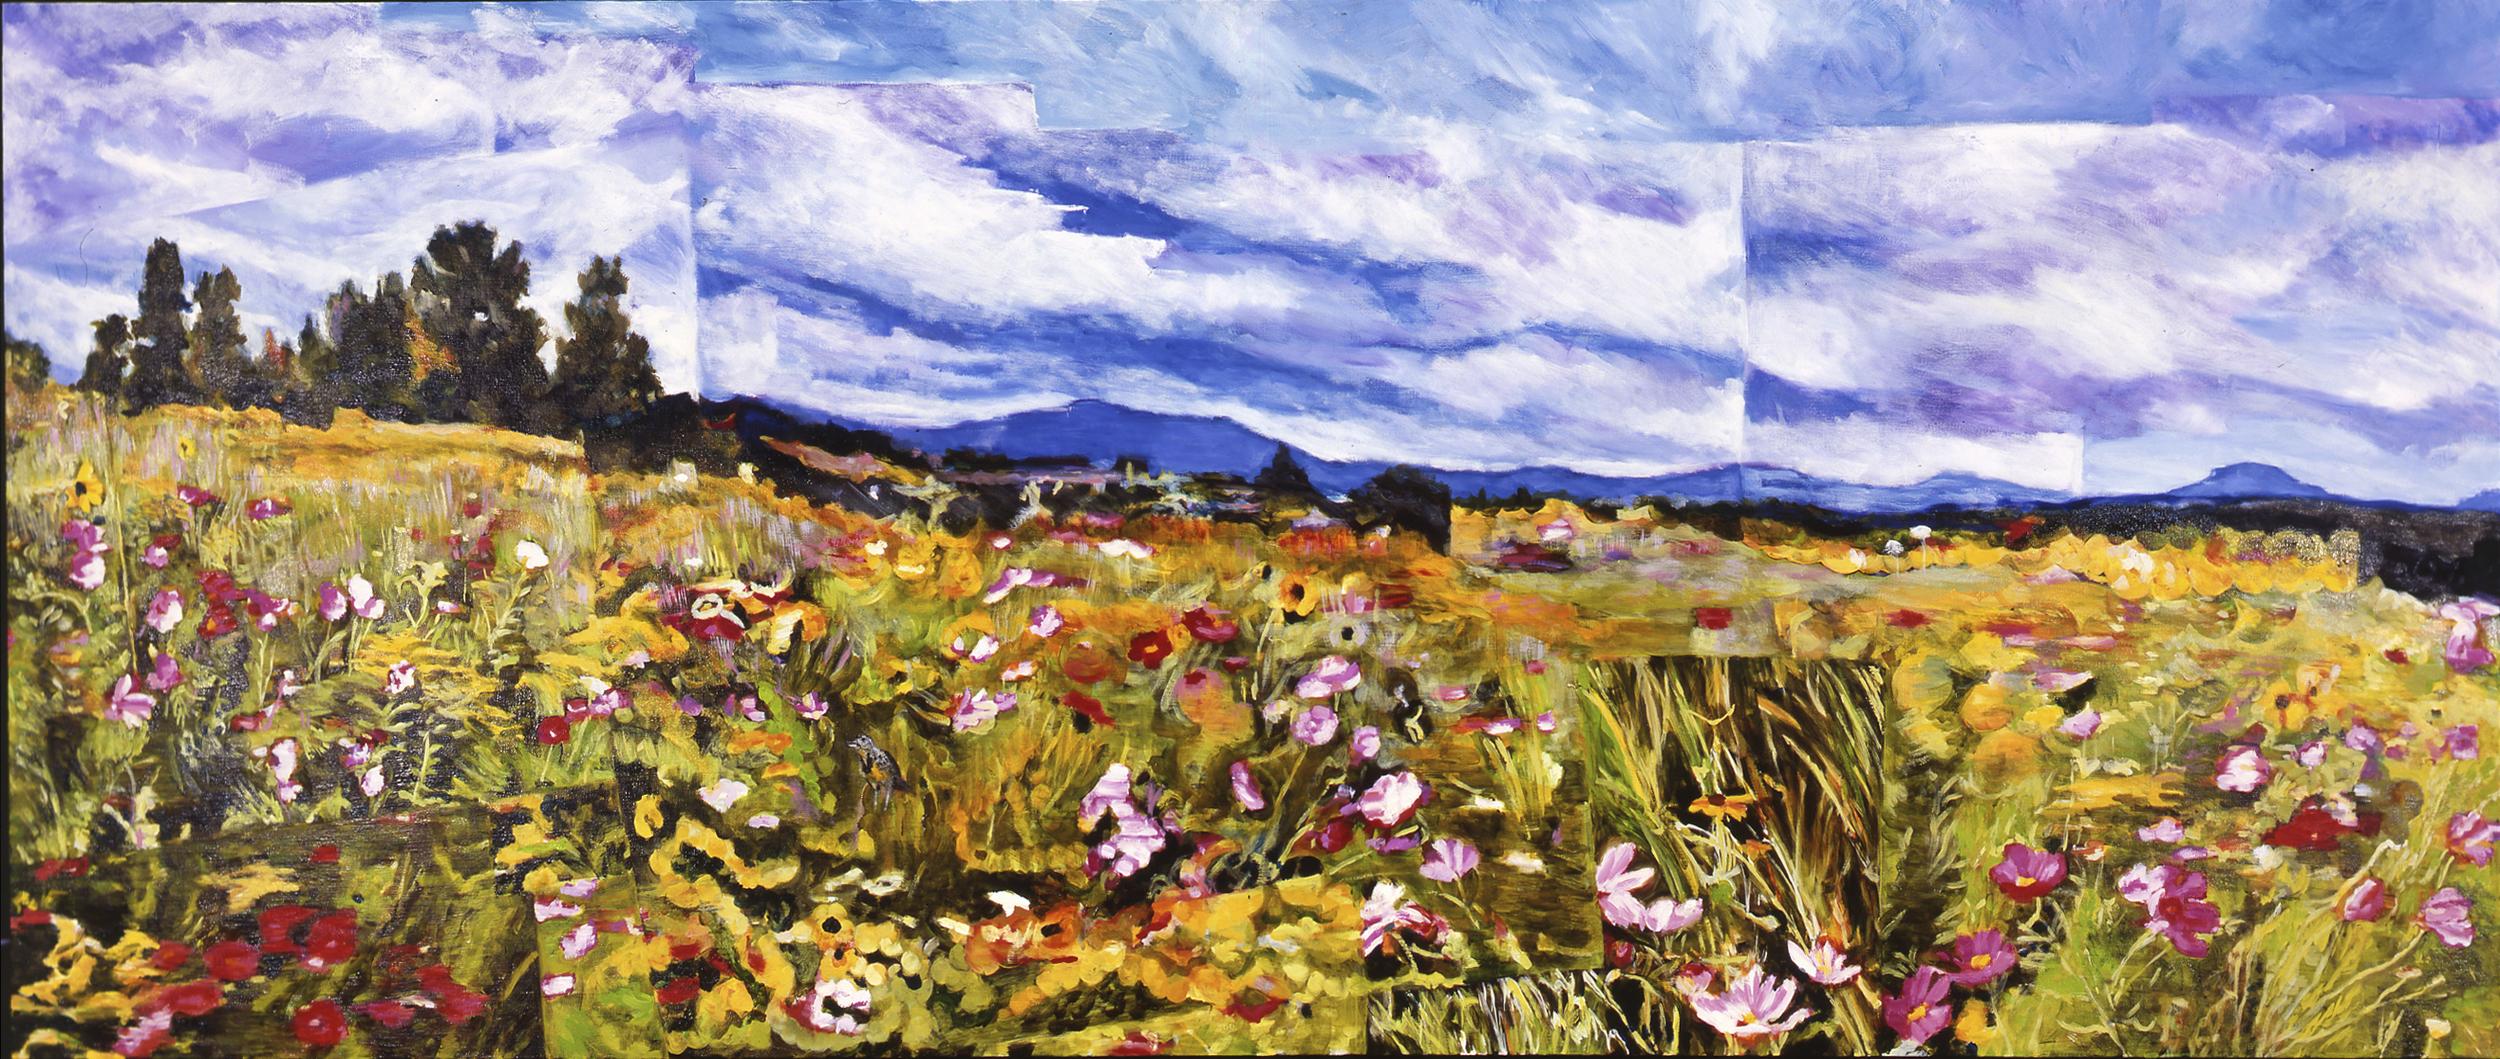 16 Field Panorama.jpg